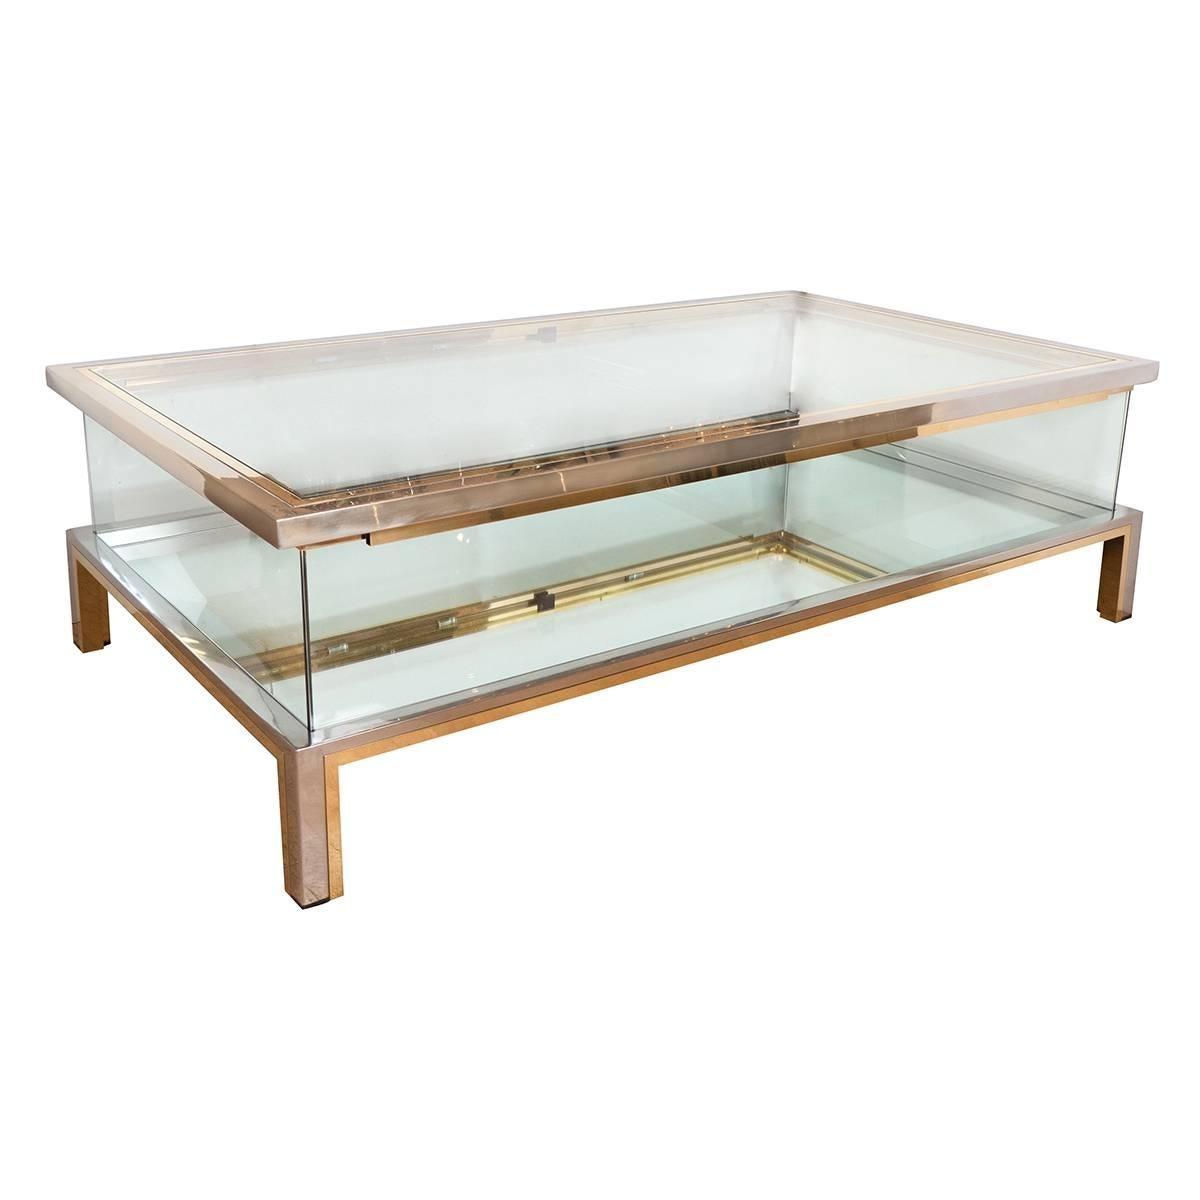 Rectangular Brass, Nickel and Glass Coffee Table